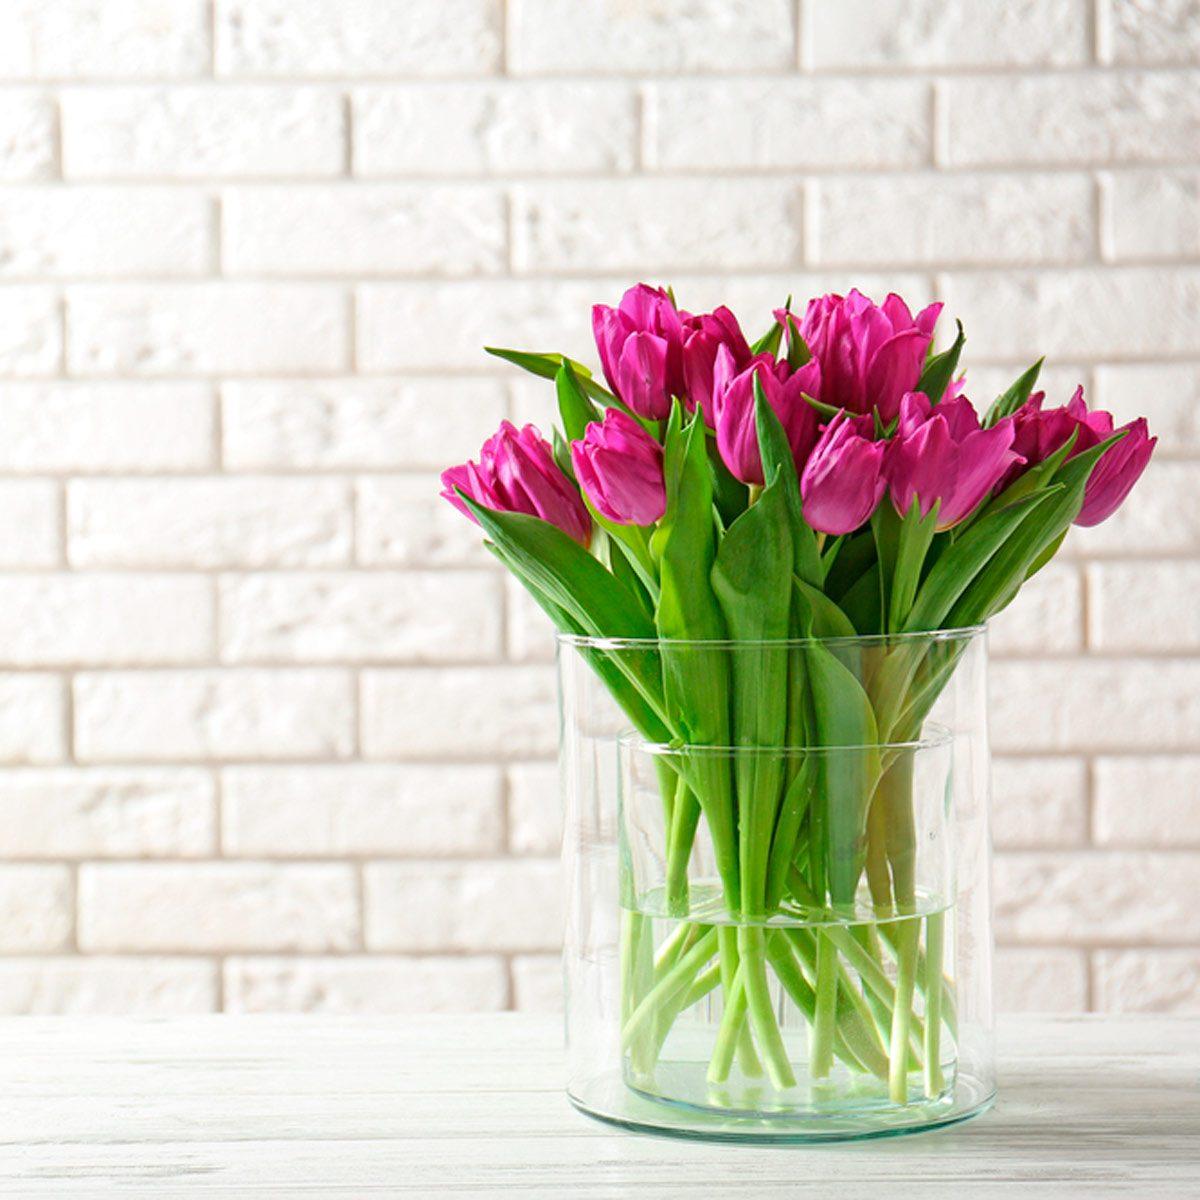 Vase of purple tulips